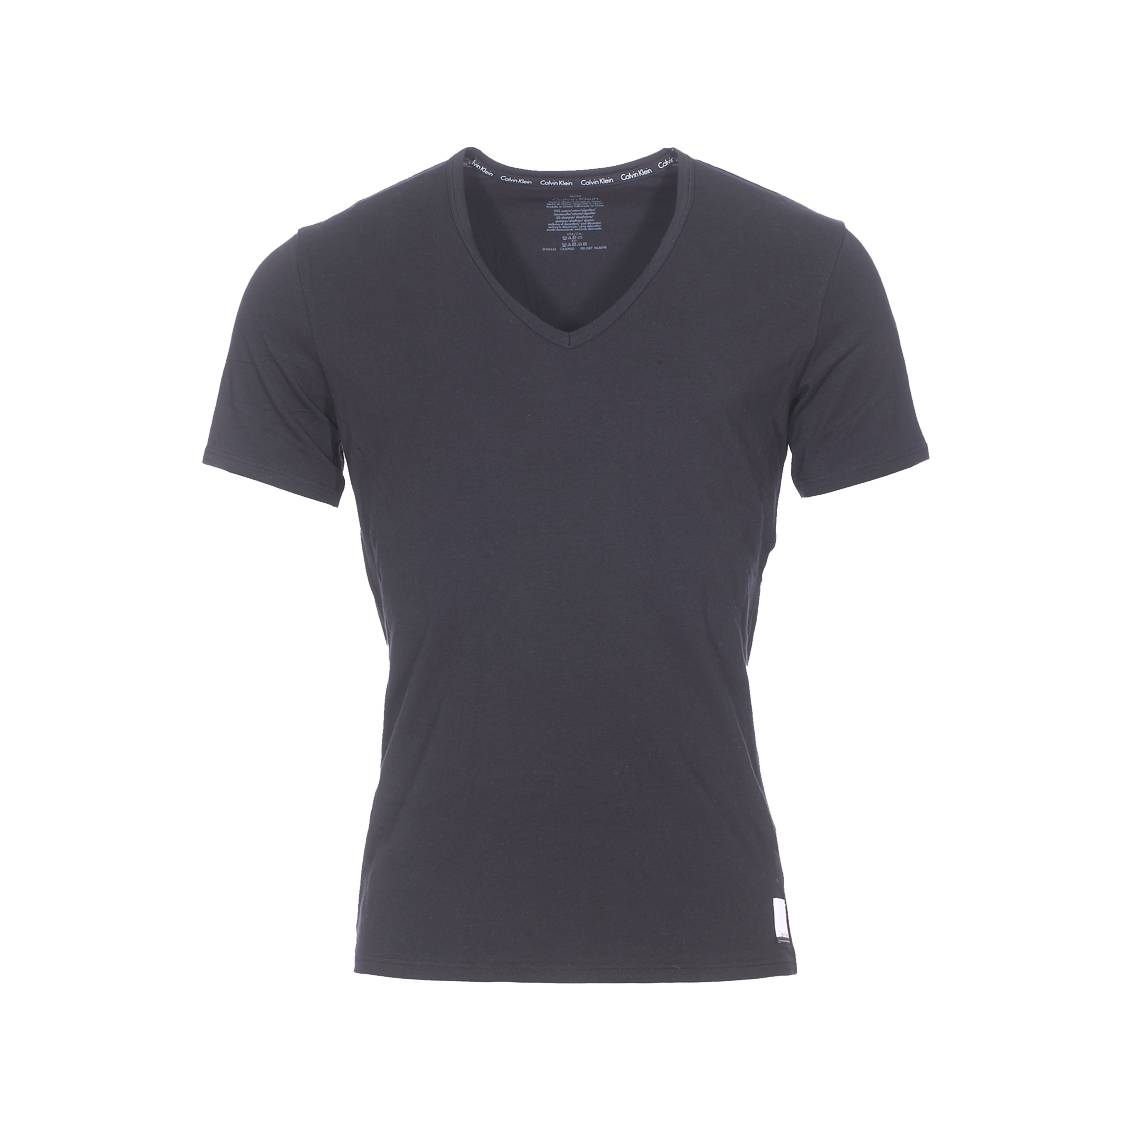 lot de 2 tee shirts col v calvin klein en coton stretch. Black Bedroom Furniture Sets. Home Design Ideas